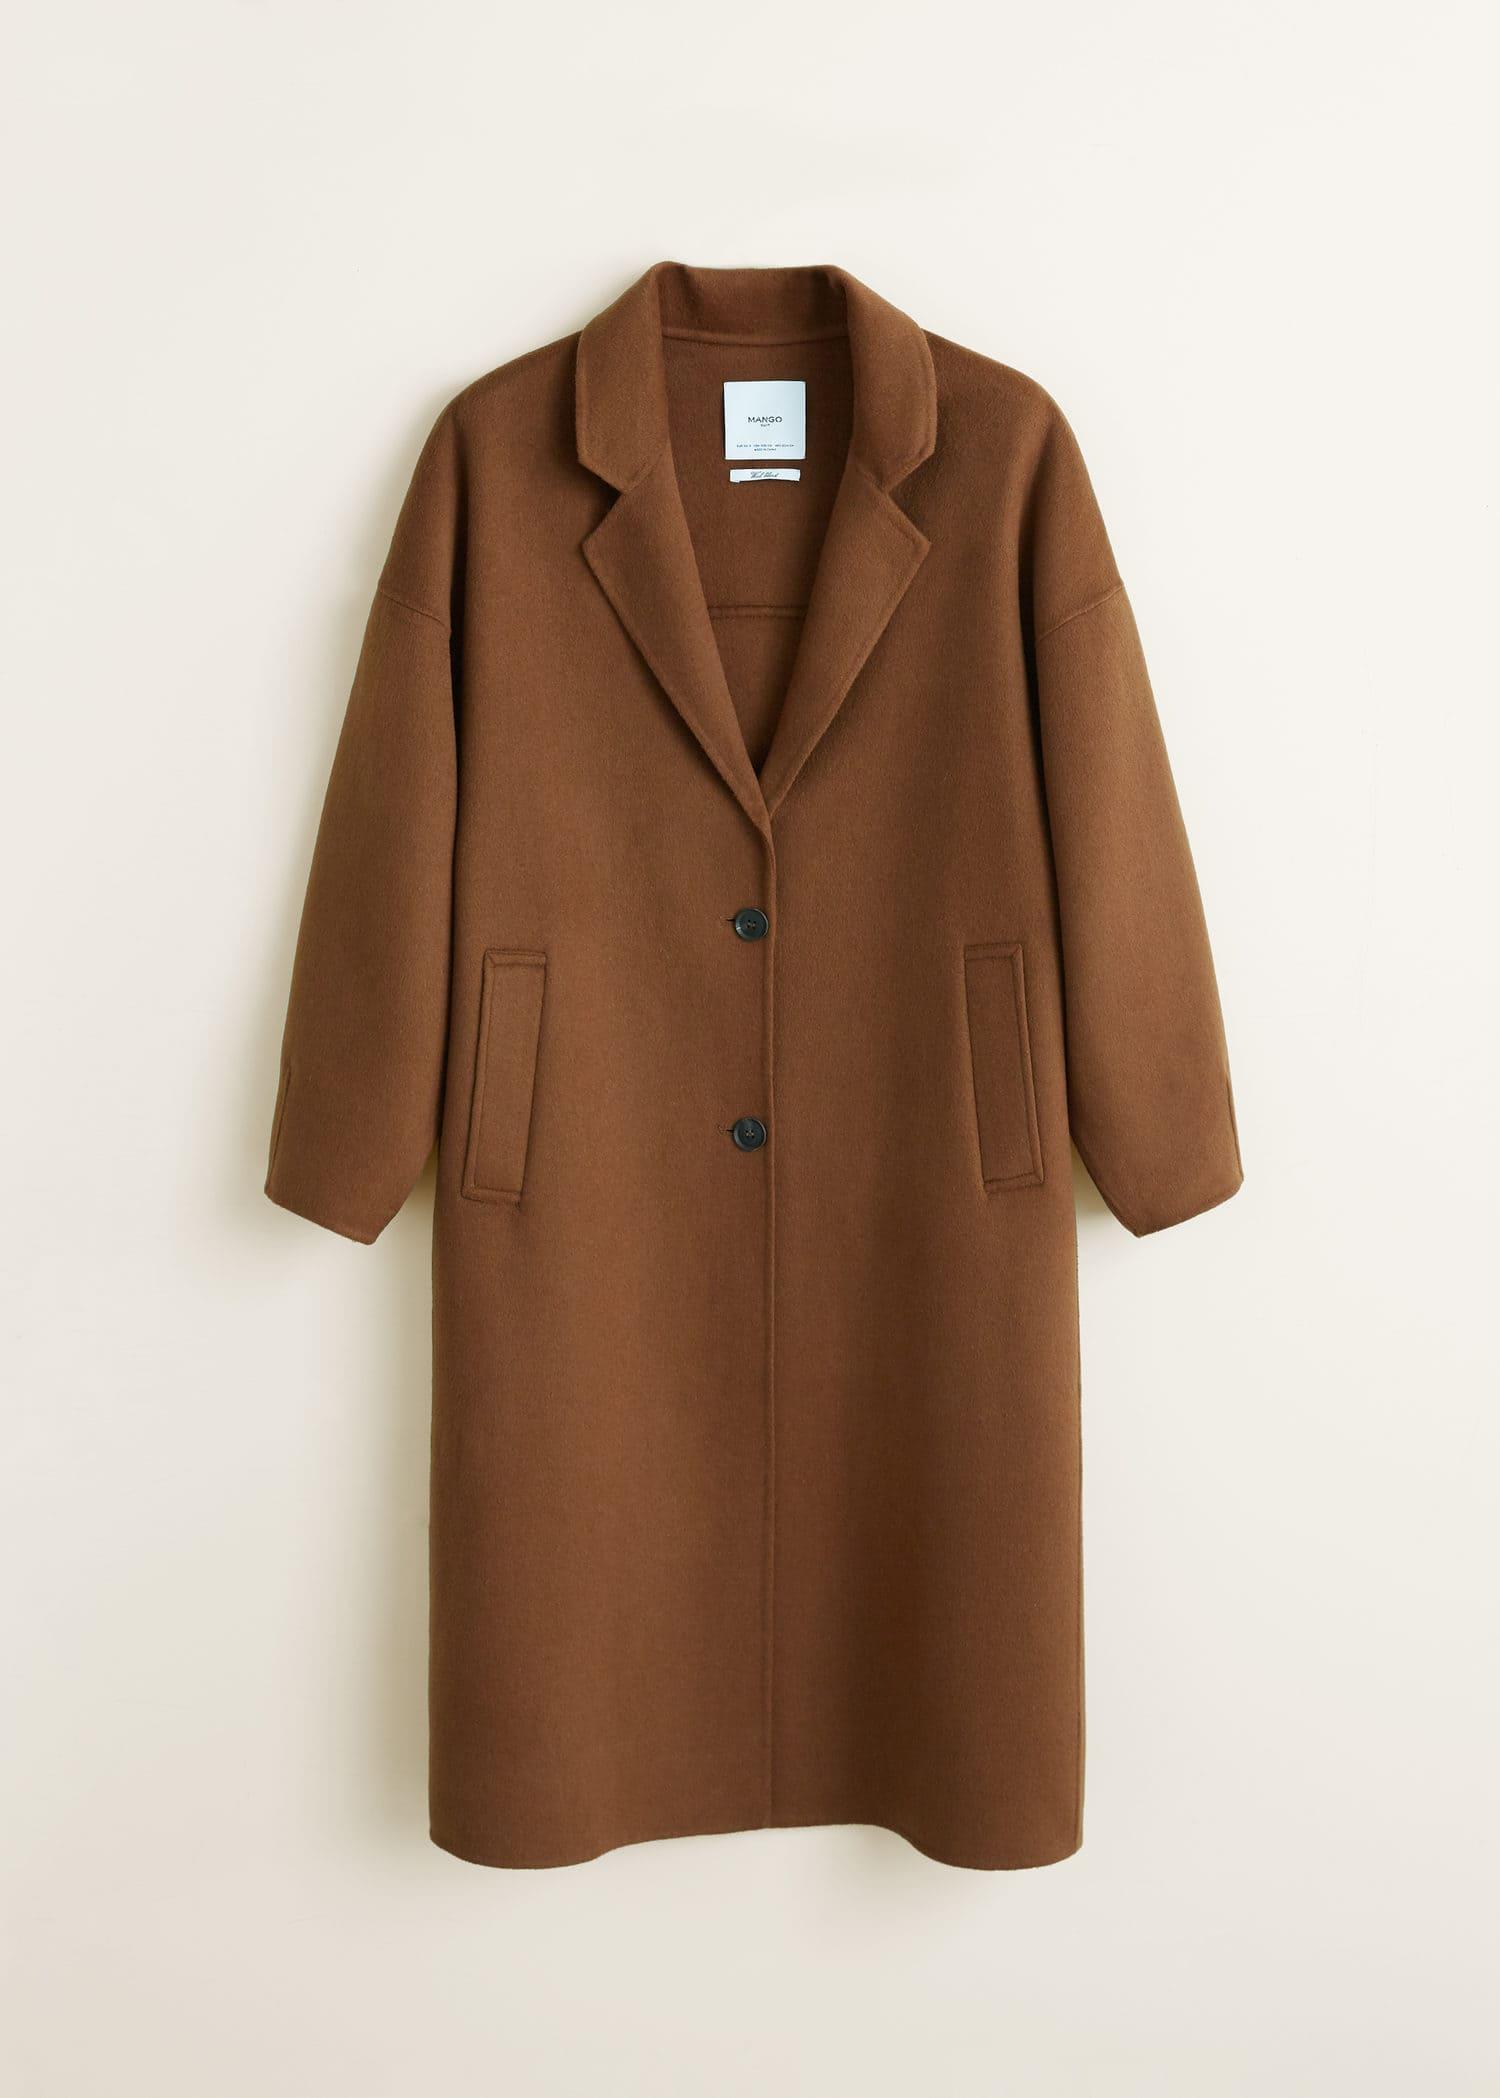 coatsCoatFashion Handmade mantel DamenMango DamenMango Handmade mantel 35AR4jL